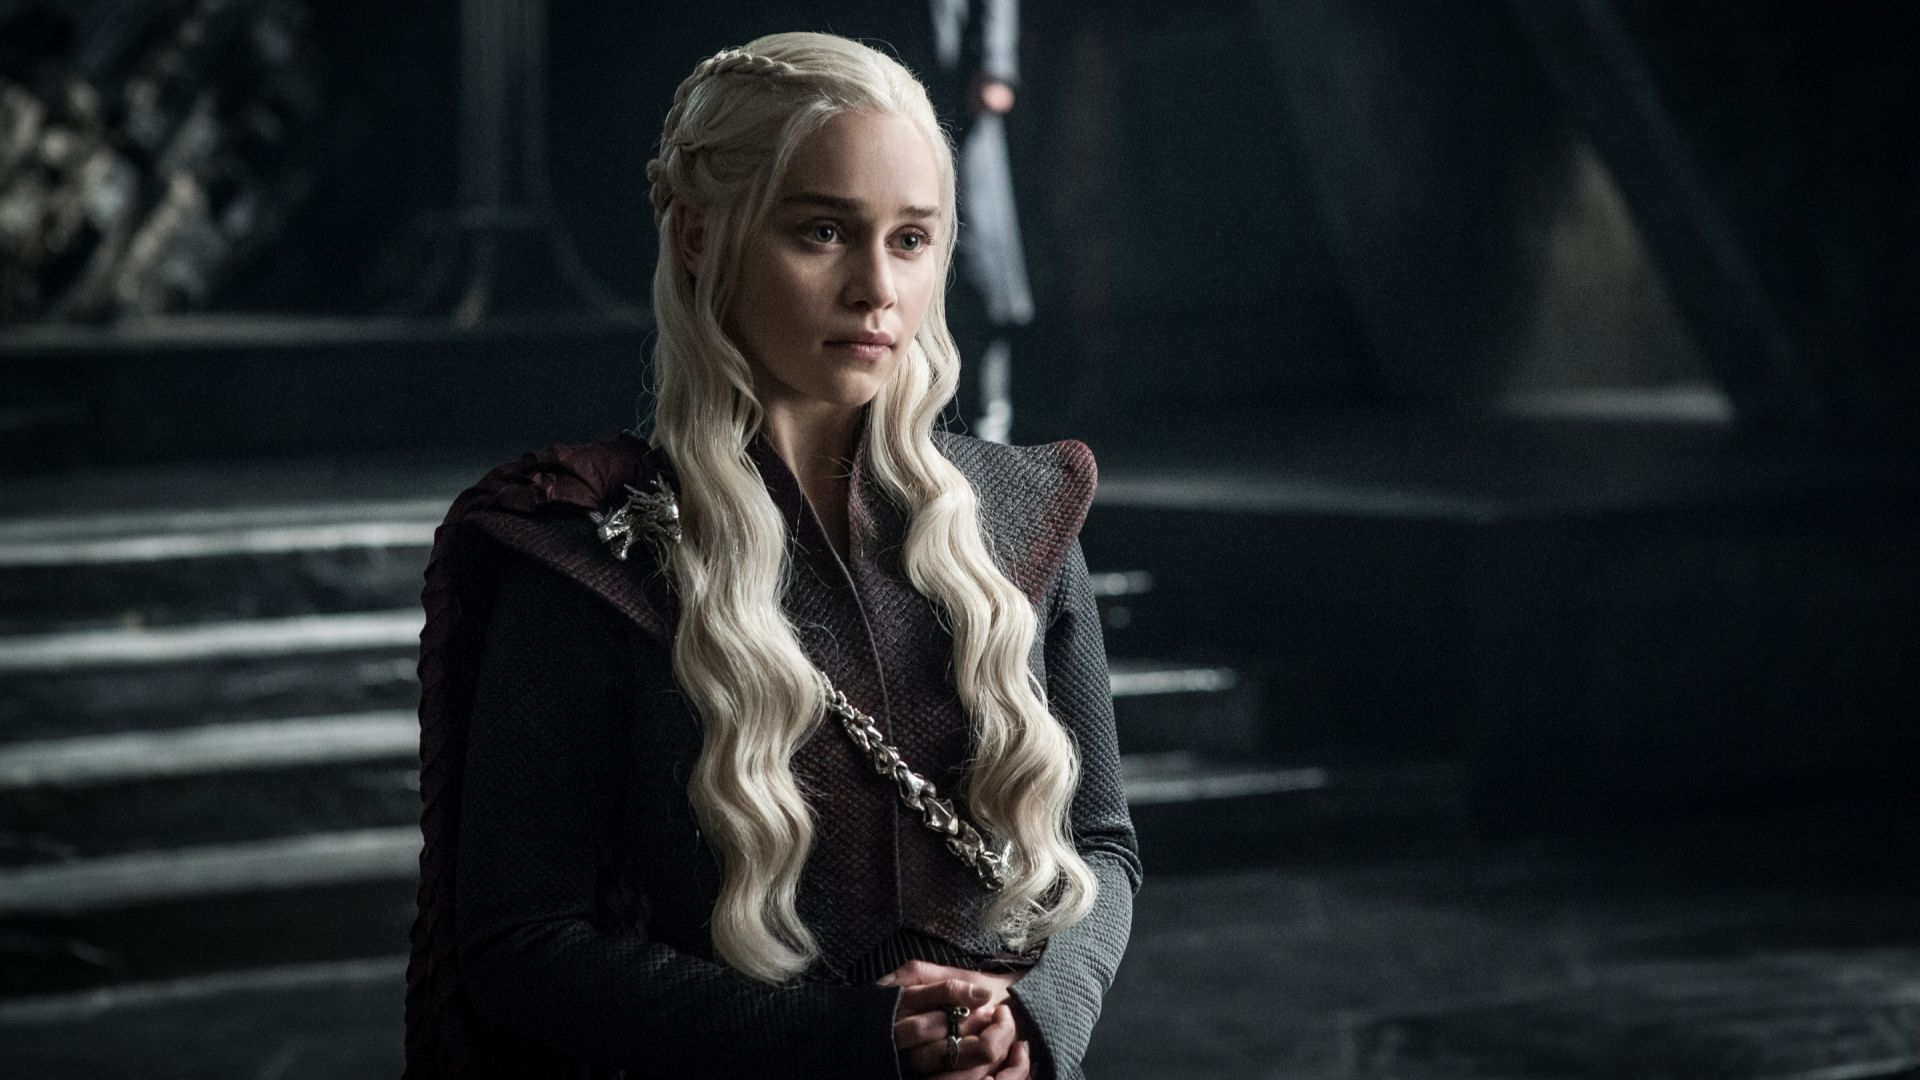 Wallpaper Daenerys Targaryen, Emilia Clarke, game of thrones, TV show